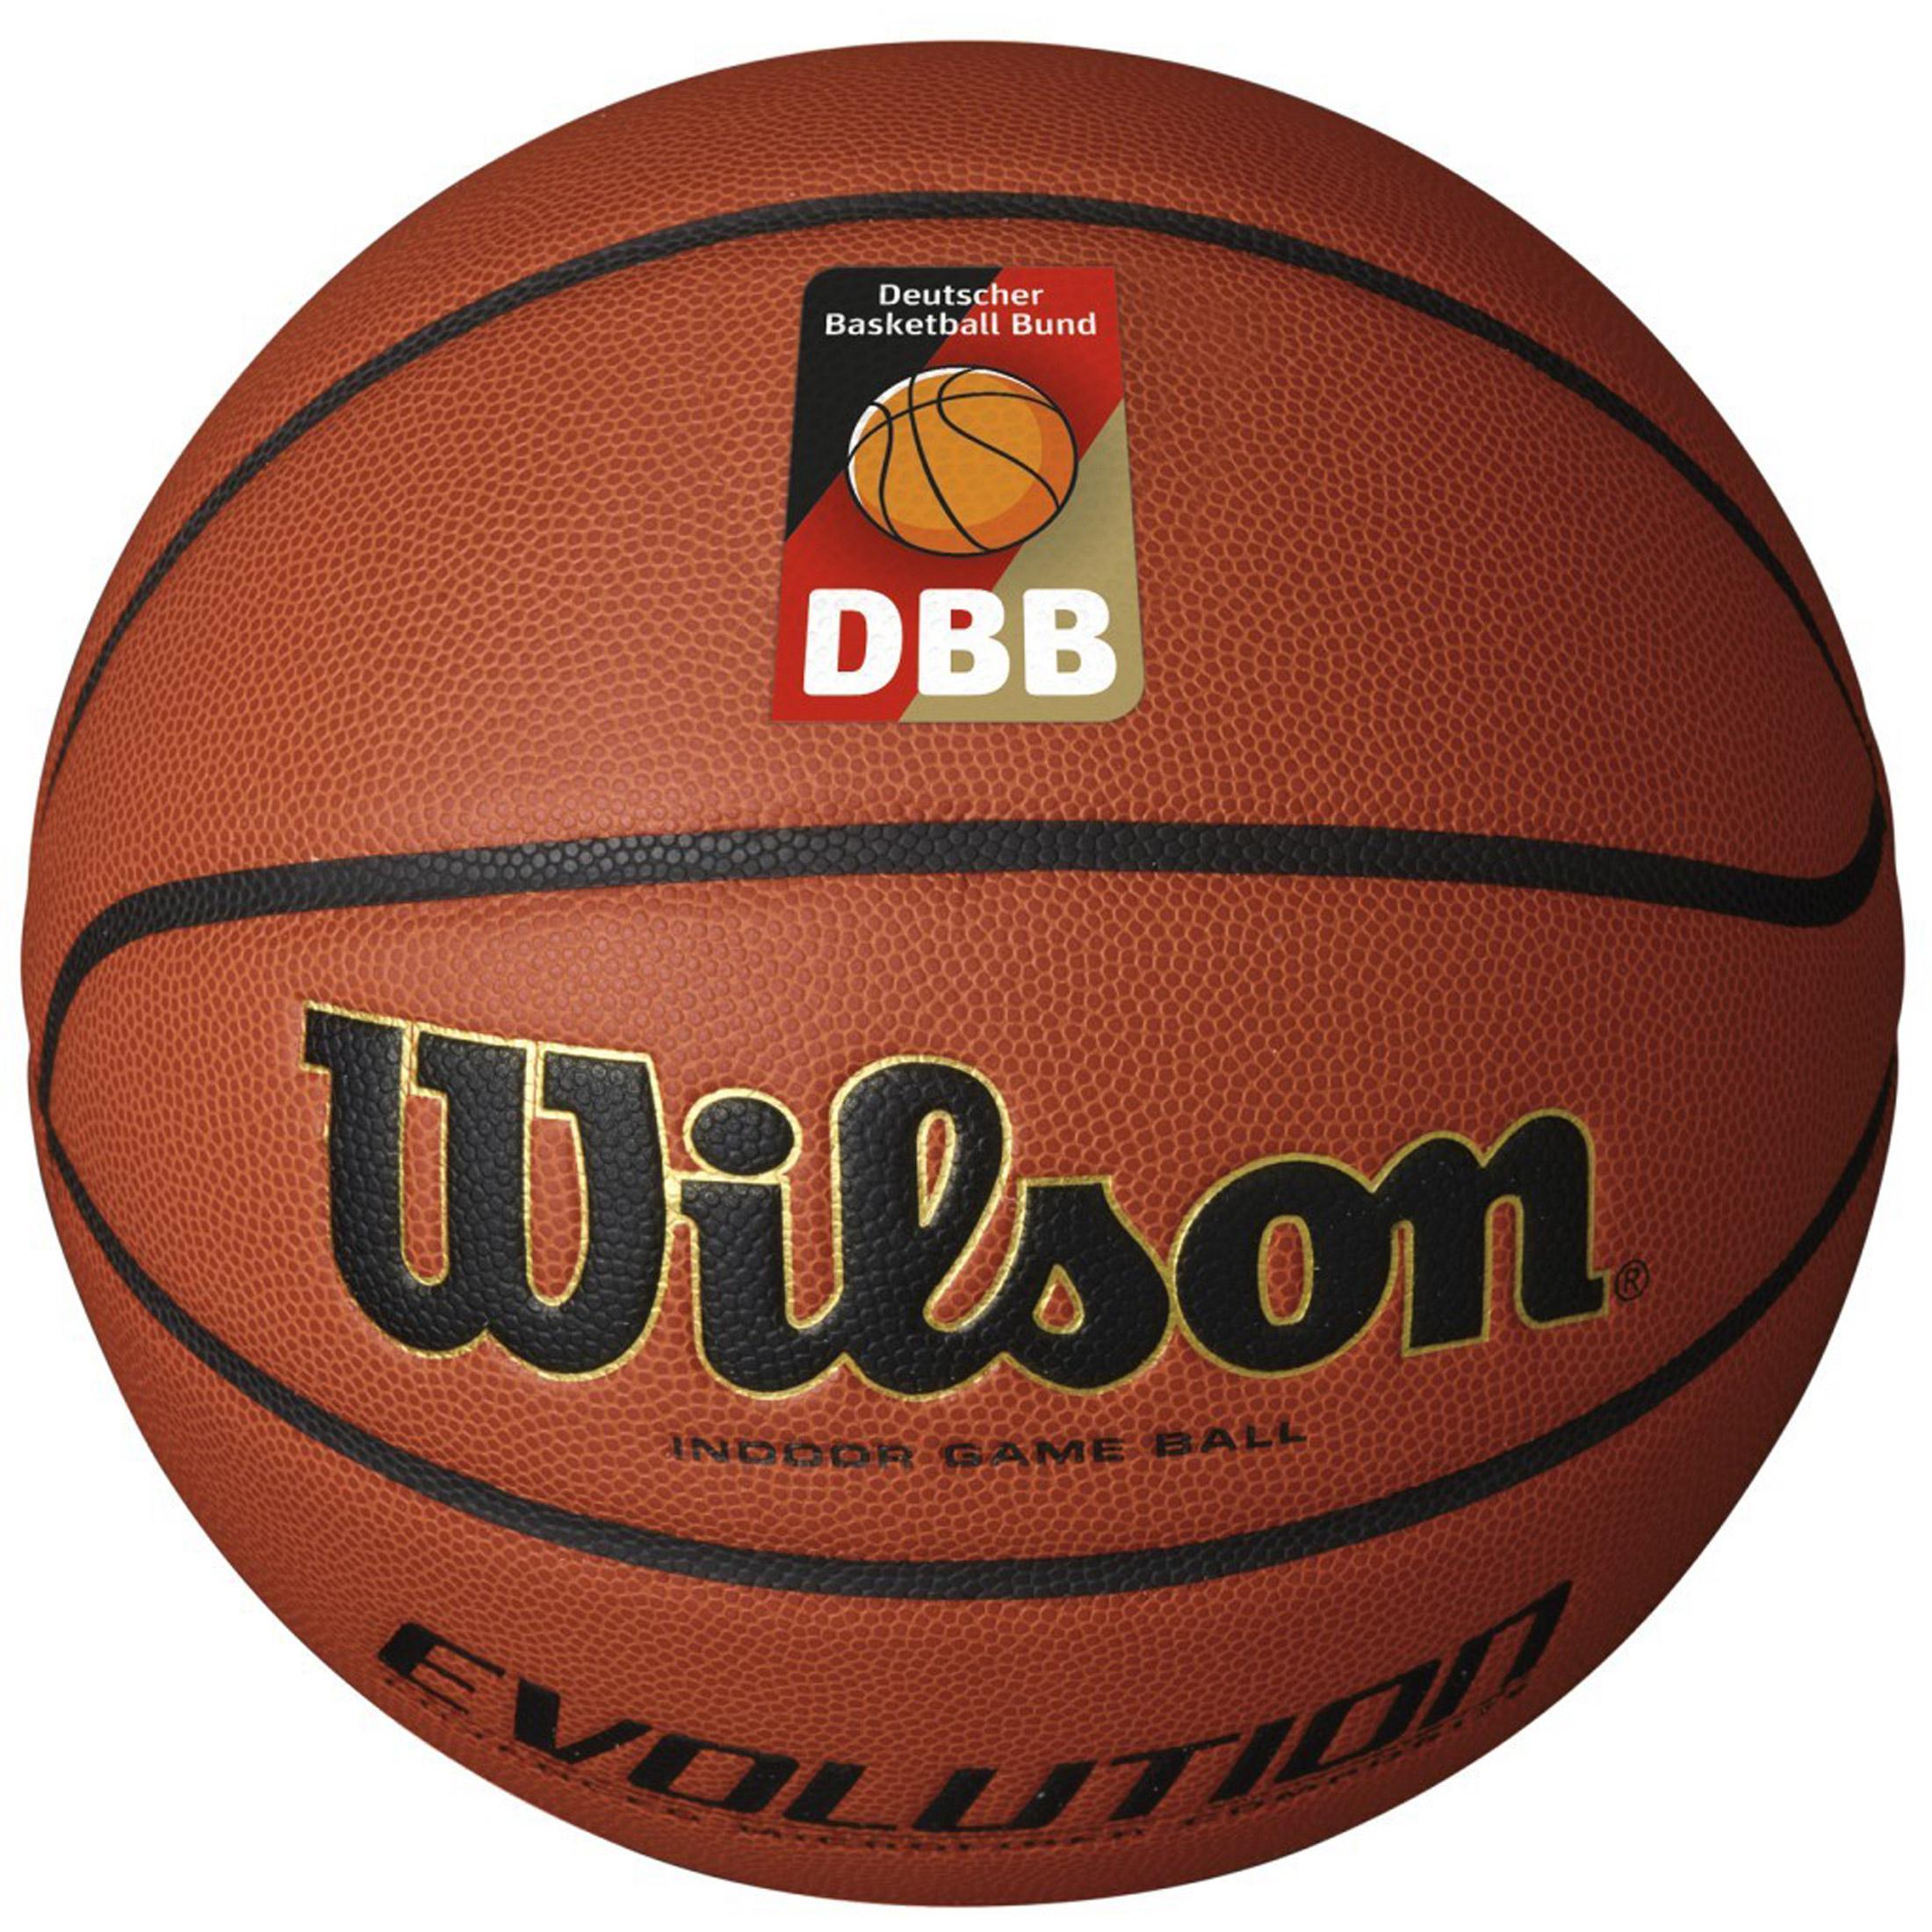 [Ballside] Wilson Evolution Gr. 7 DBB Basketball 29,57€